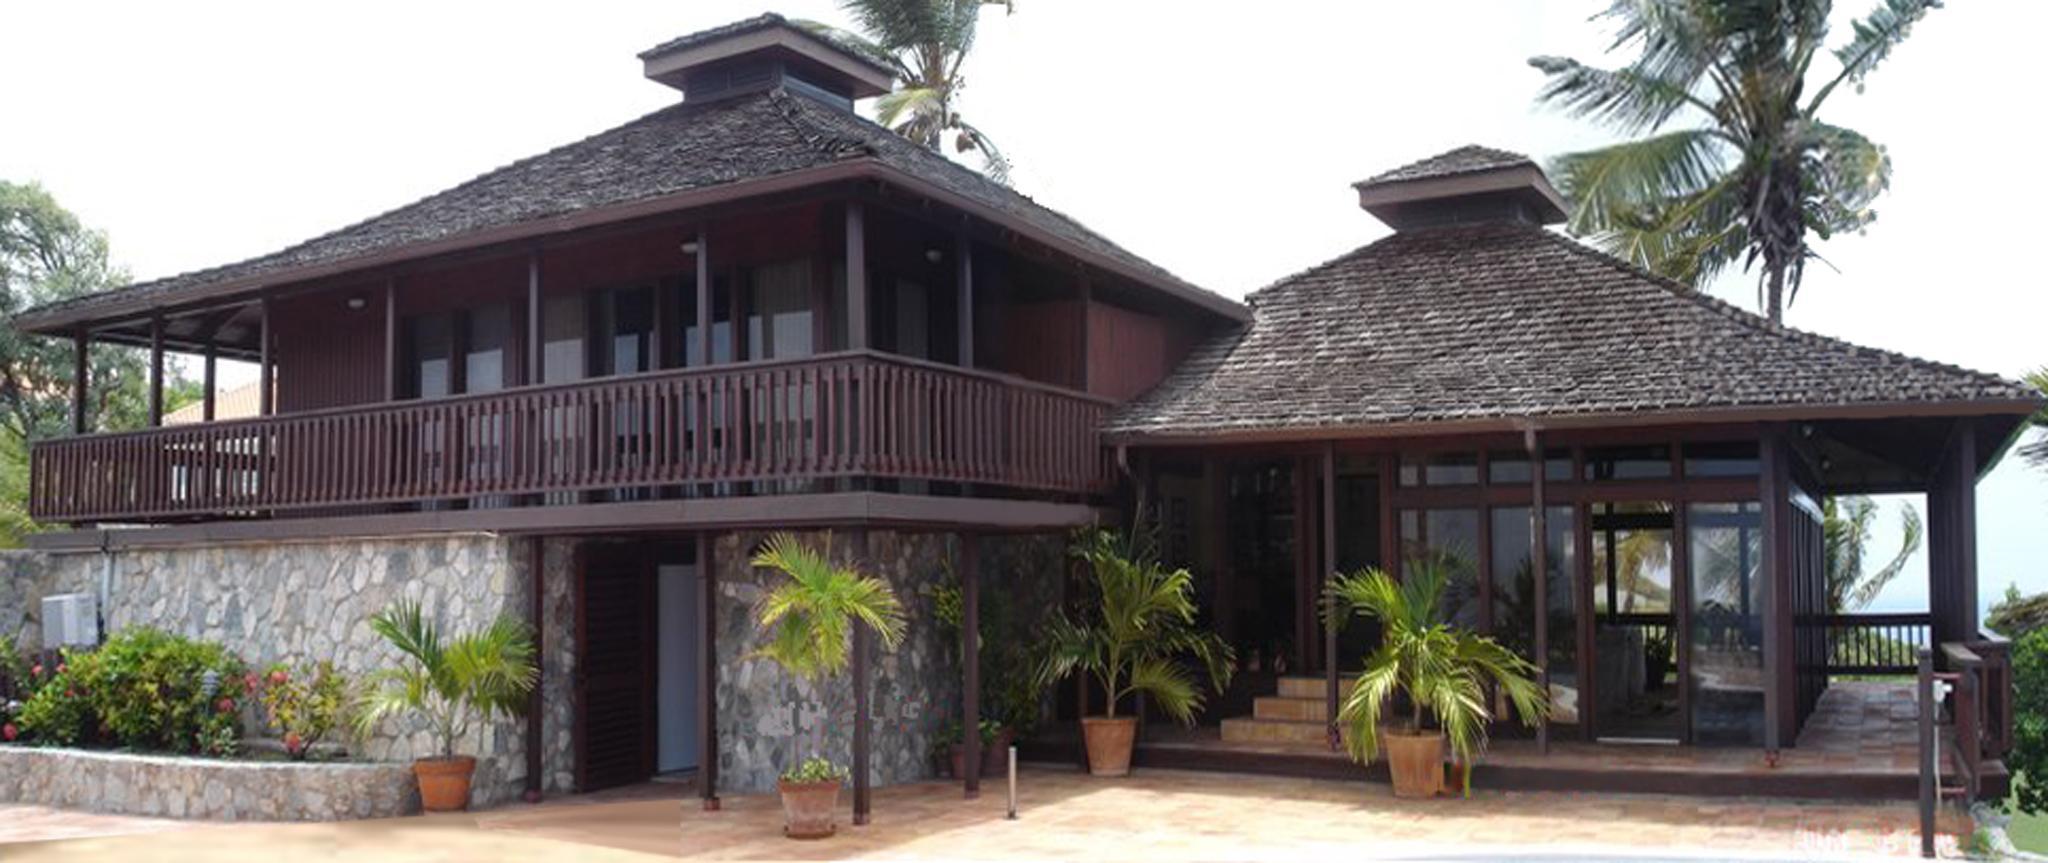 Prefab Tropical Homes House Plans